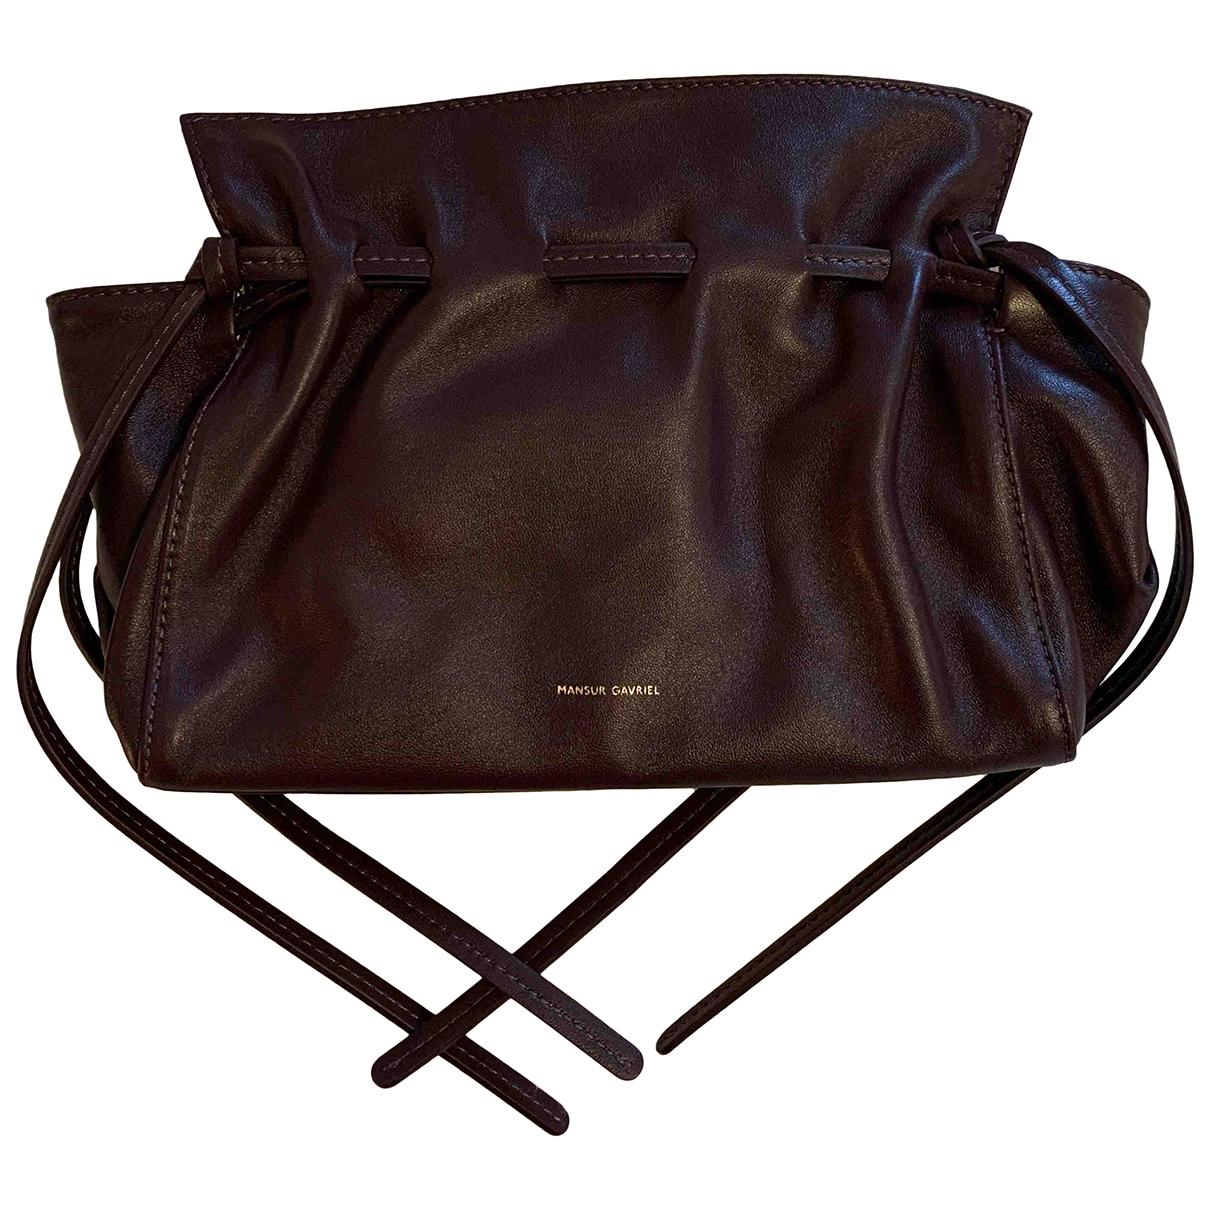 Mansur Gavriel \N Leather handbag for Women \N